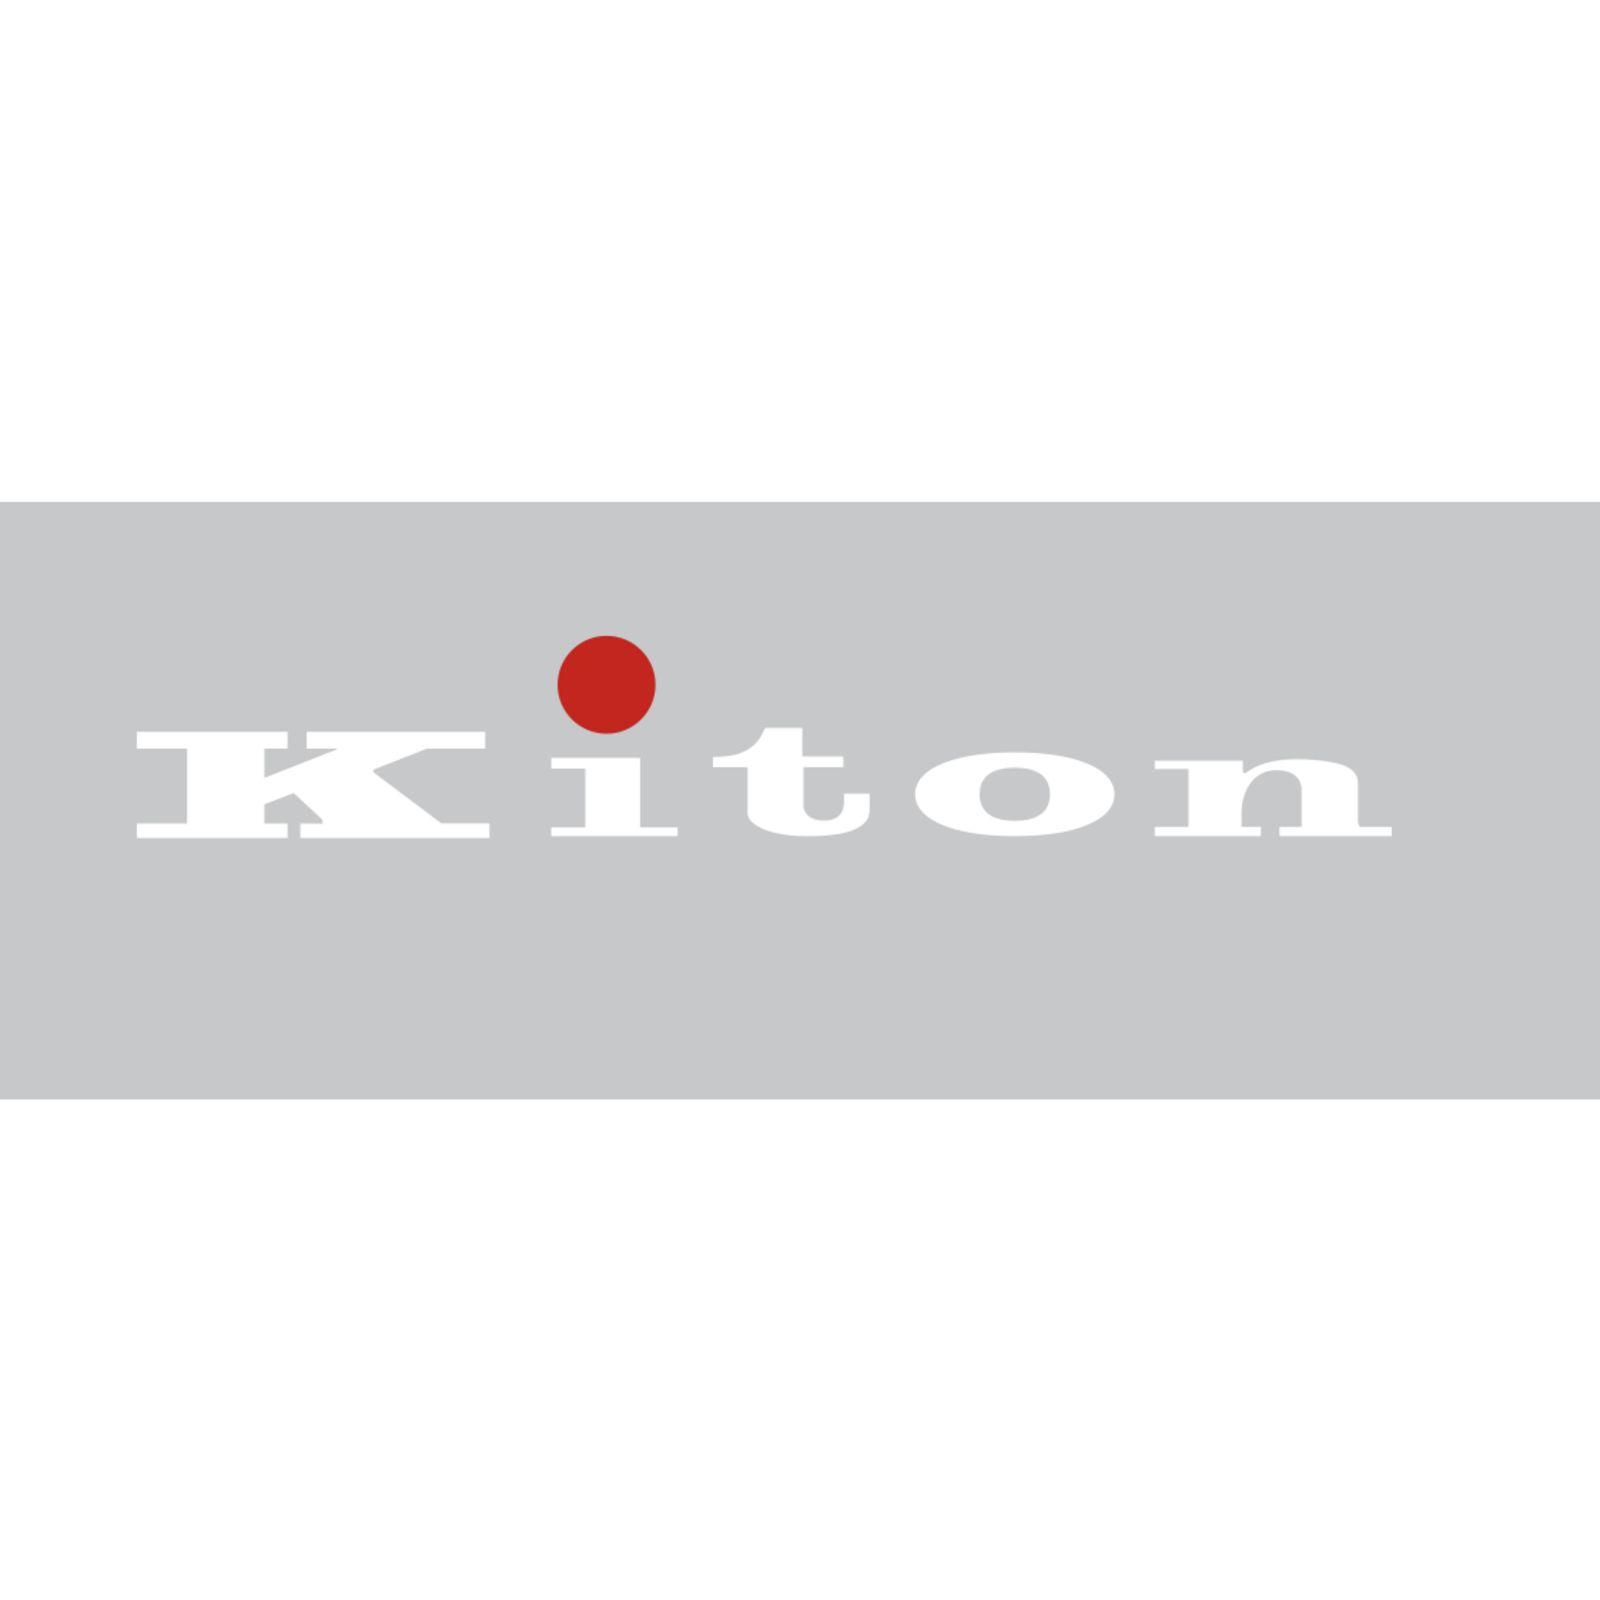 Kiton (Imagen 1)